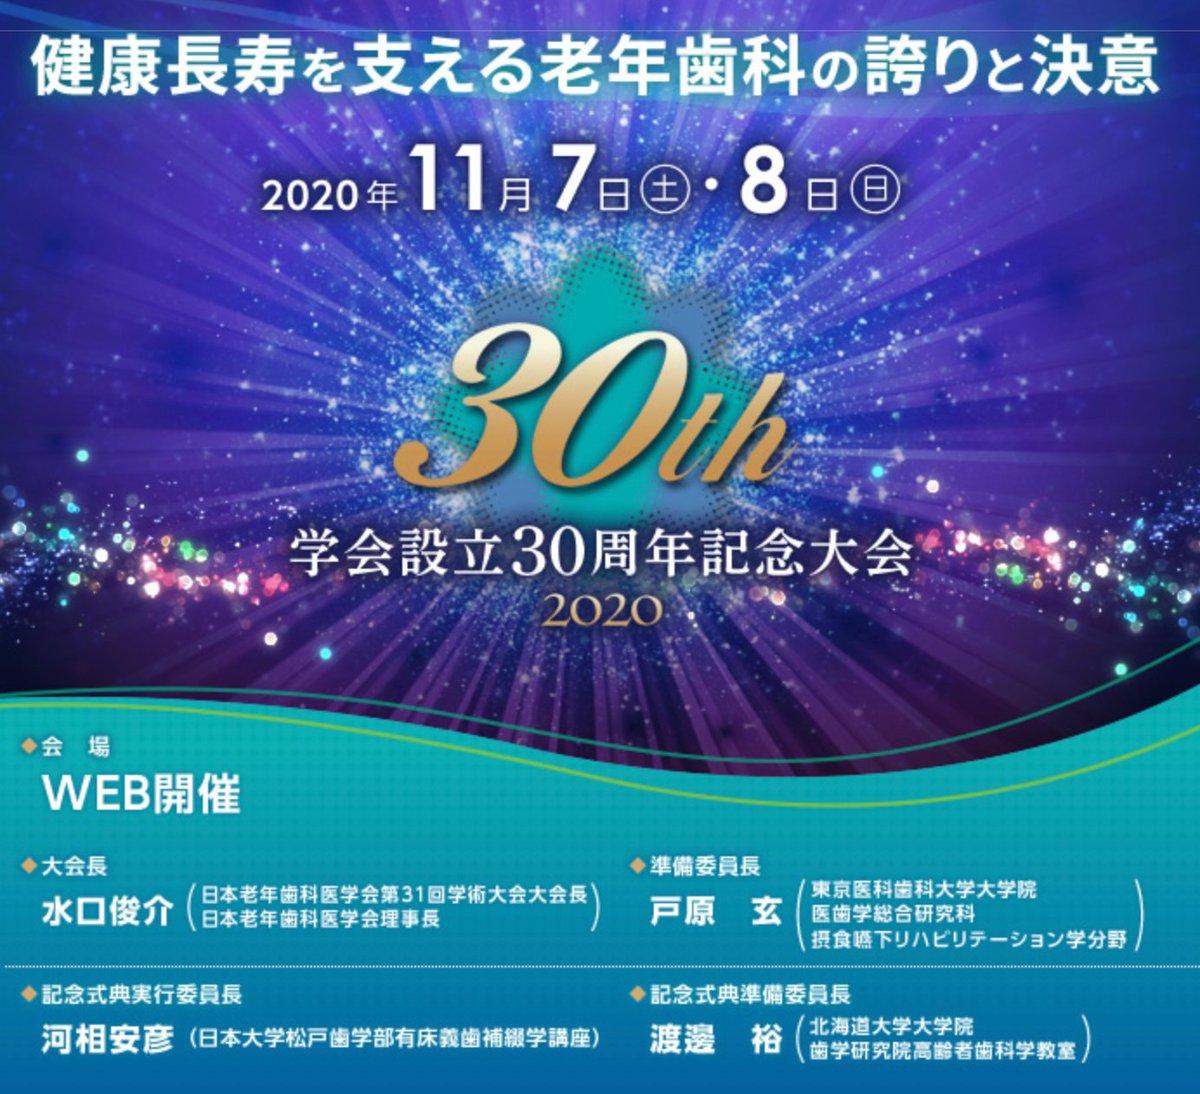 日本老年歯科医学会(公式)/ Japanese Society of Gerodontology on ...